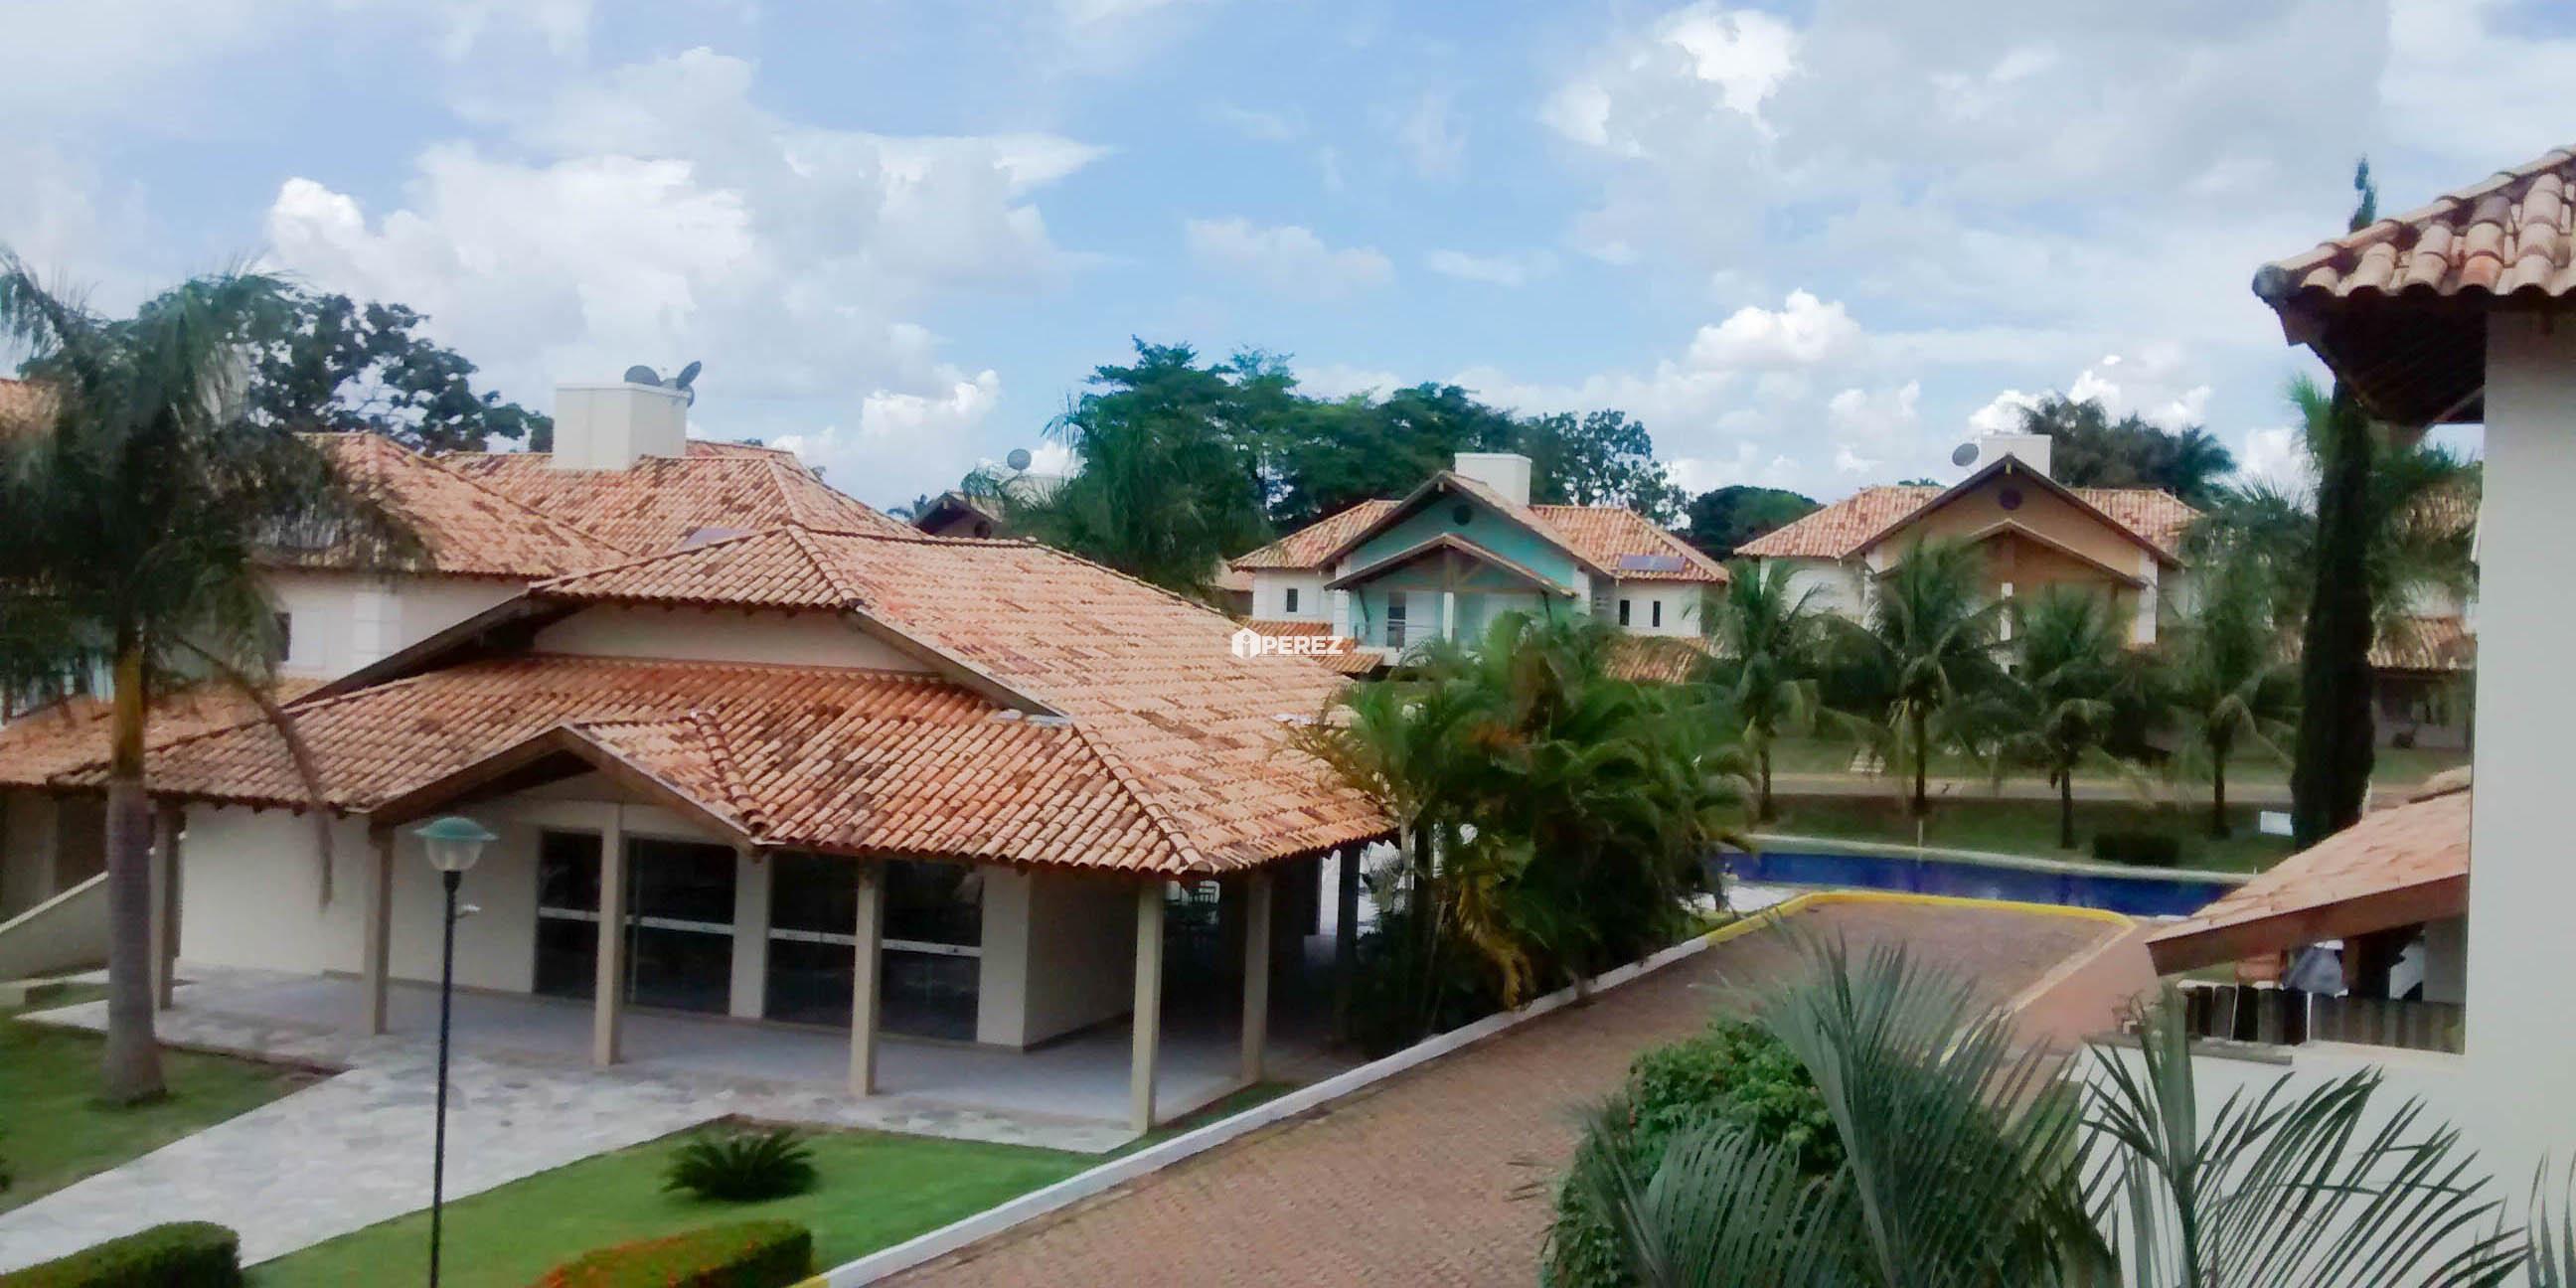 aluguel-campo-grande-ms-sobradocondominio-nossa-senhora-das-merces-chacara-cachoeira-perez-imoveis